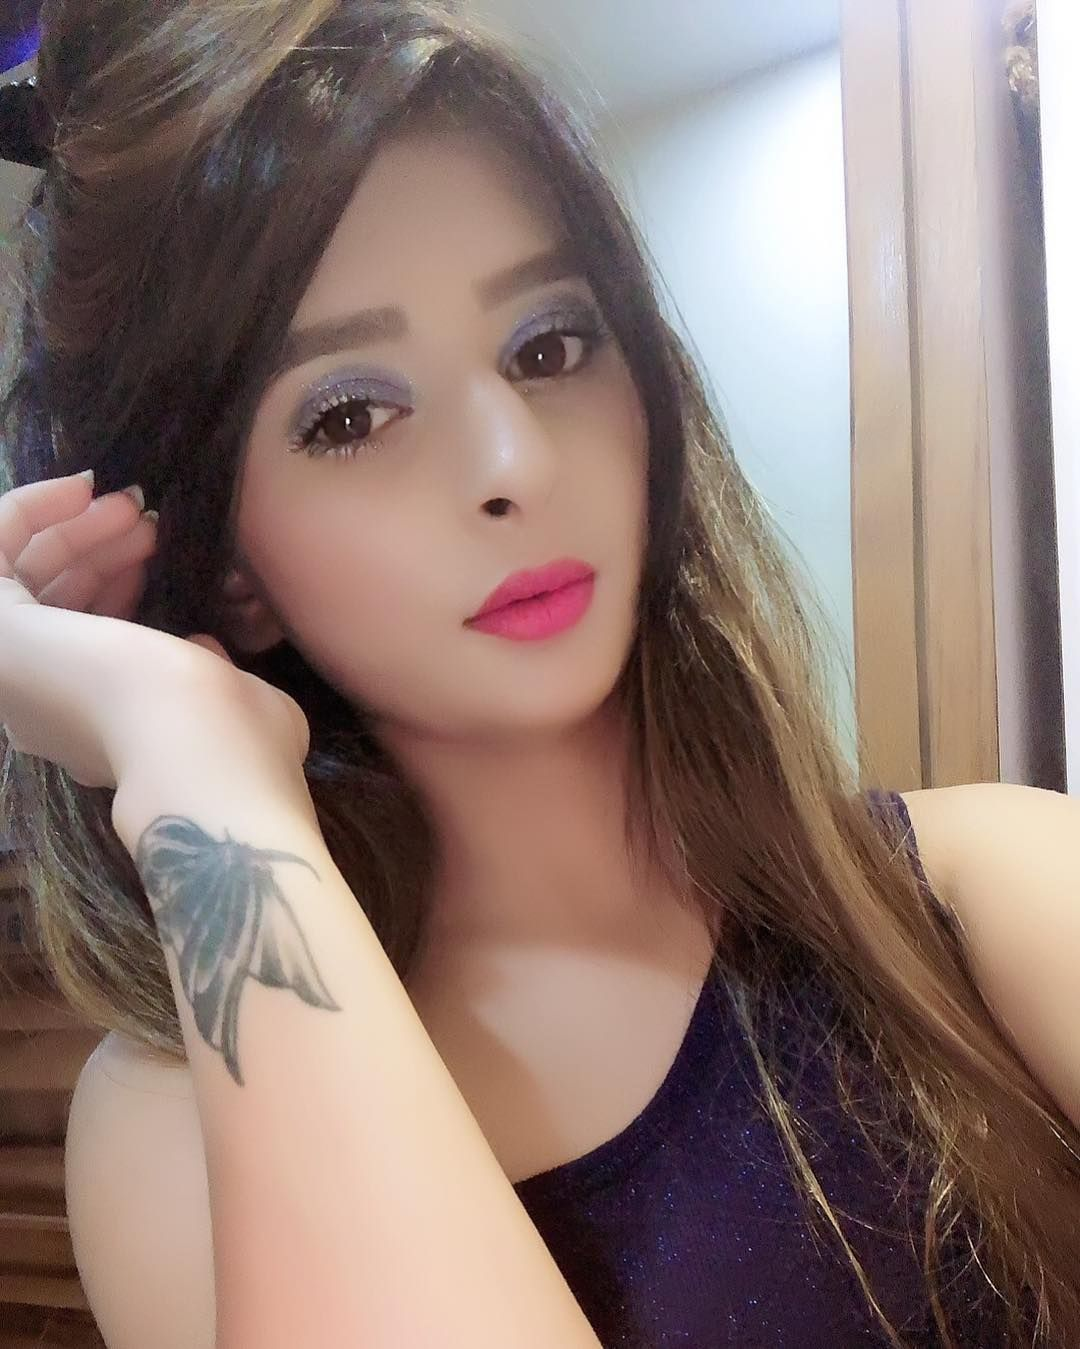 Hot Desi Teen Model Pics View More